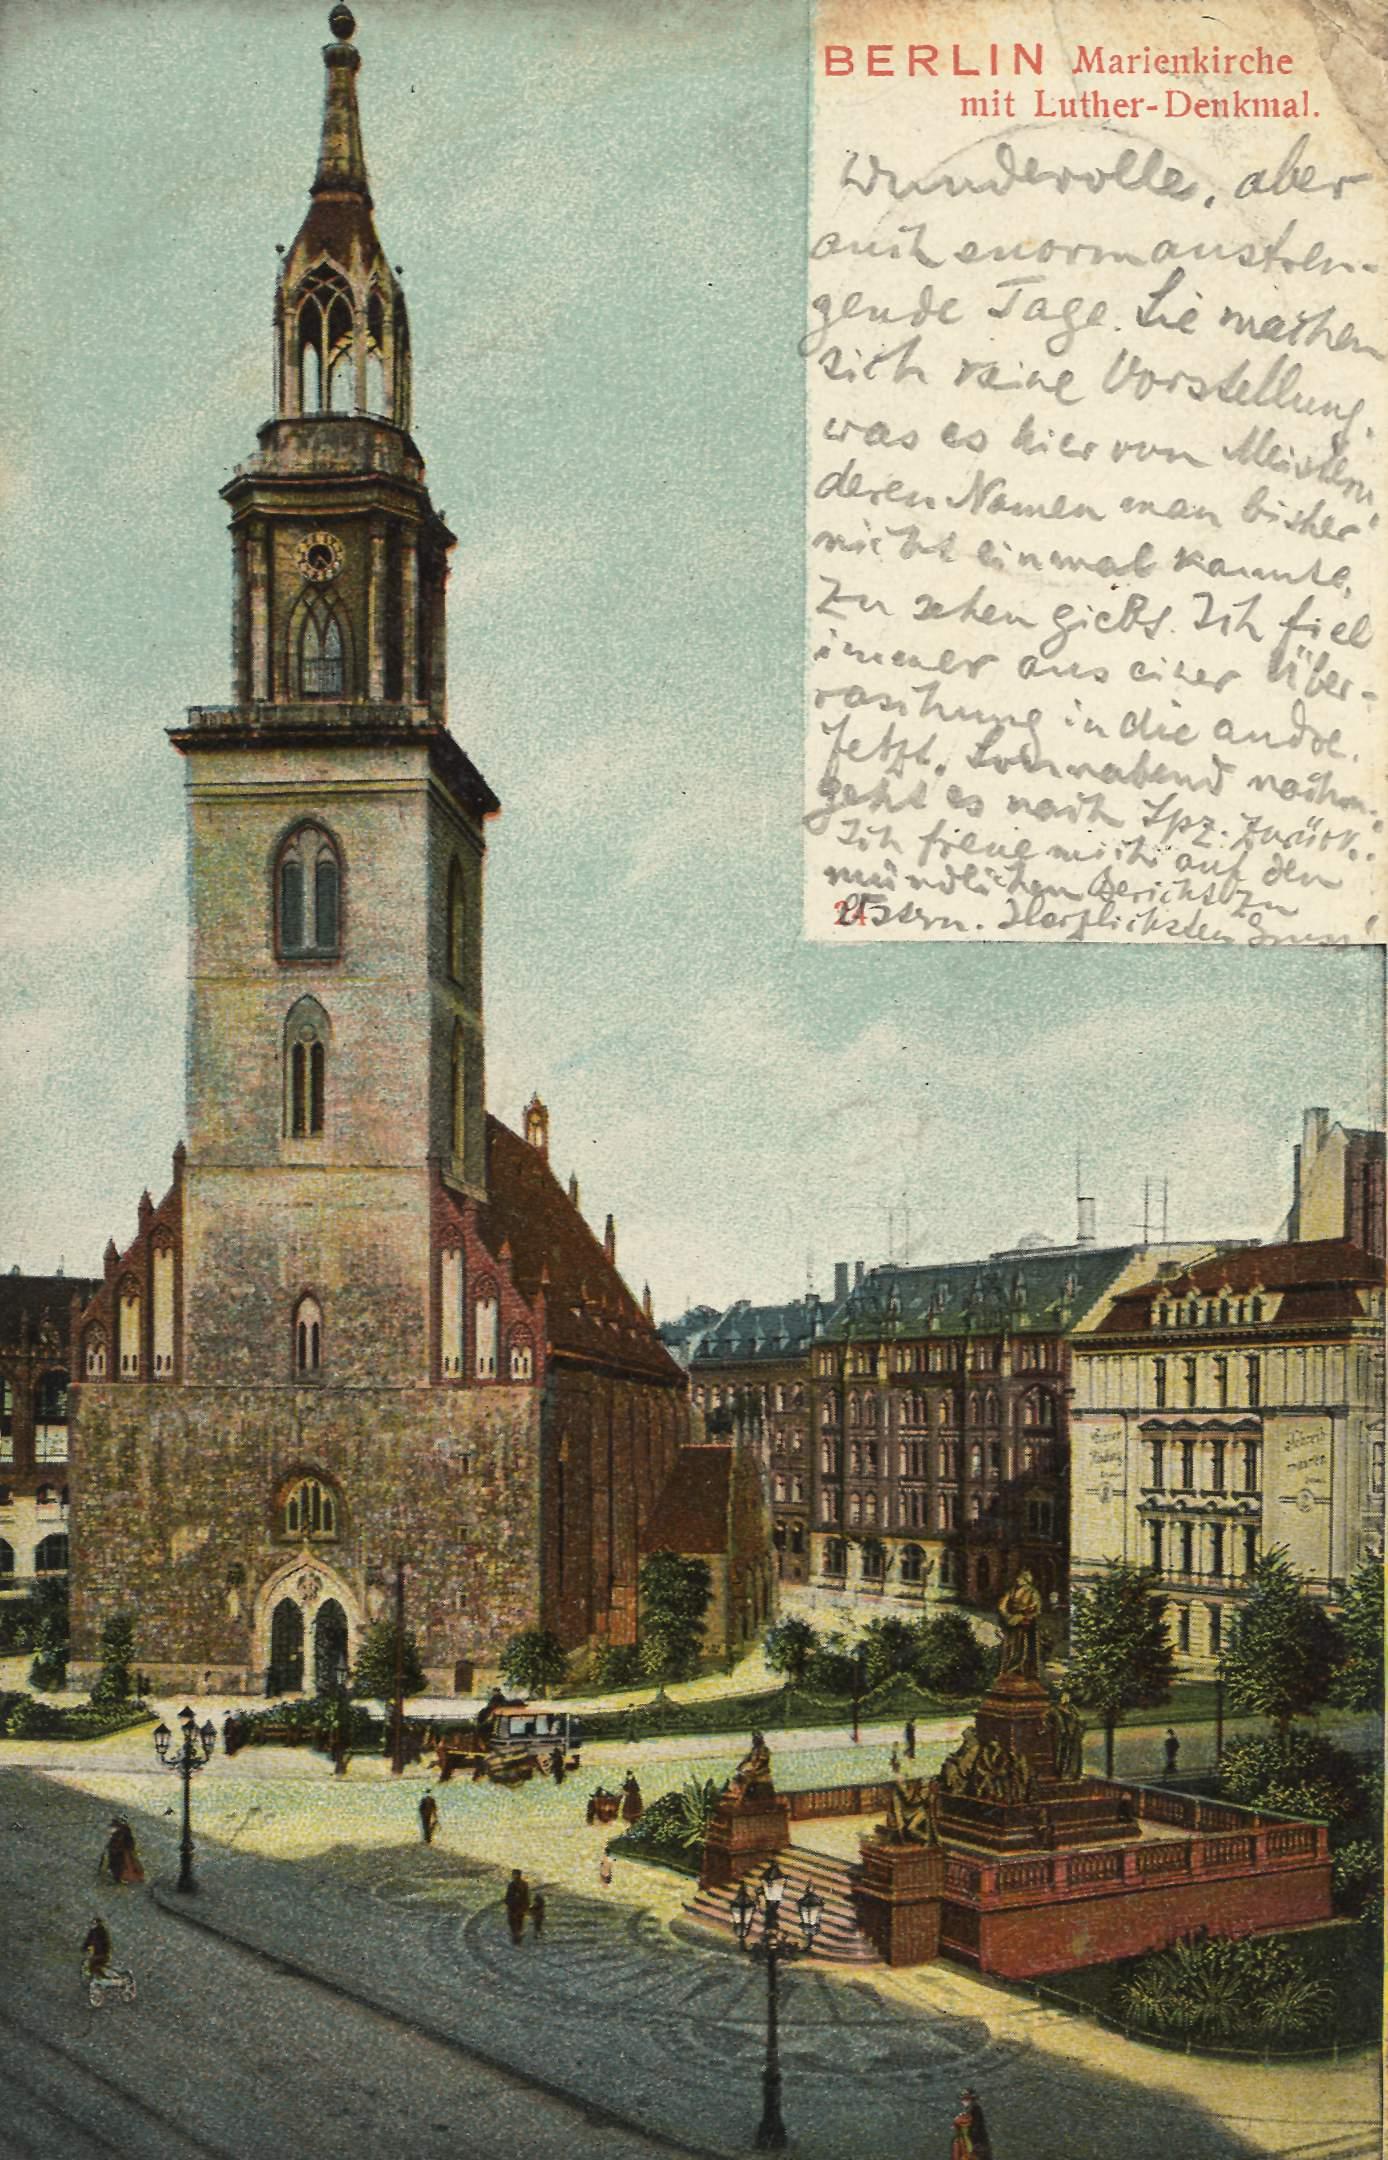 Berlin Mitte St. Marienkirche Lutherdenkmal 1906.jpg